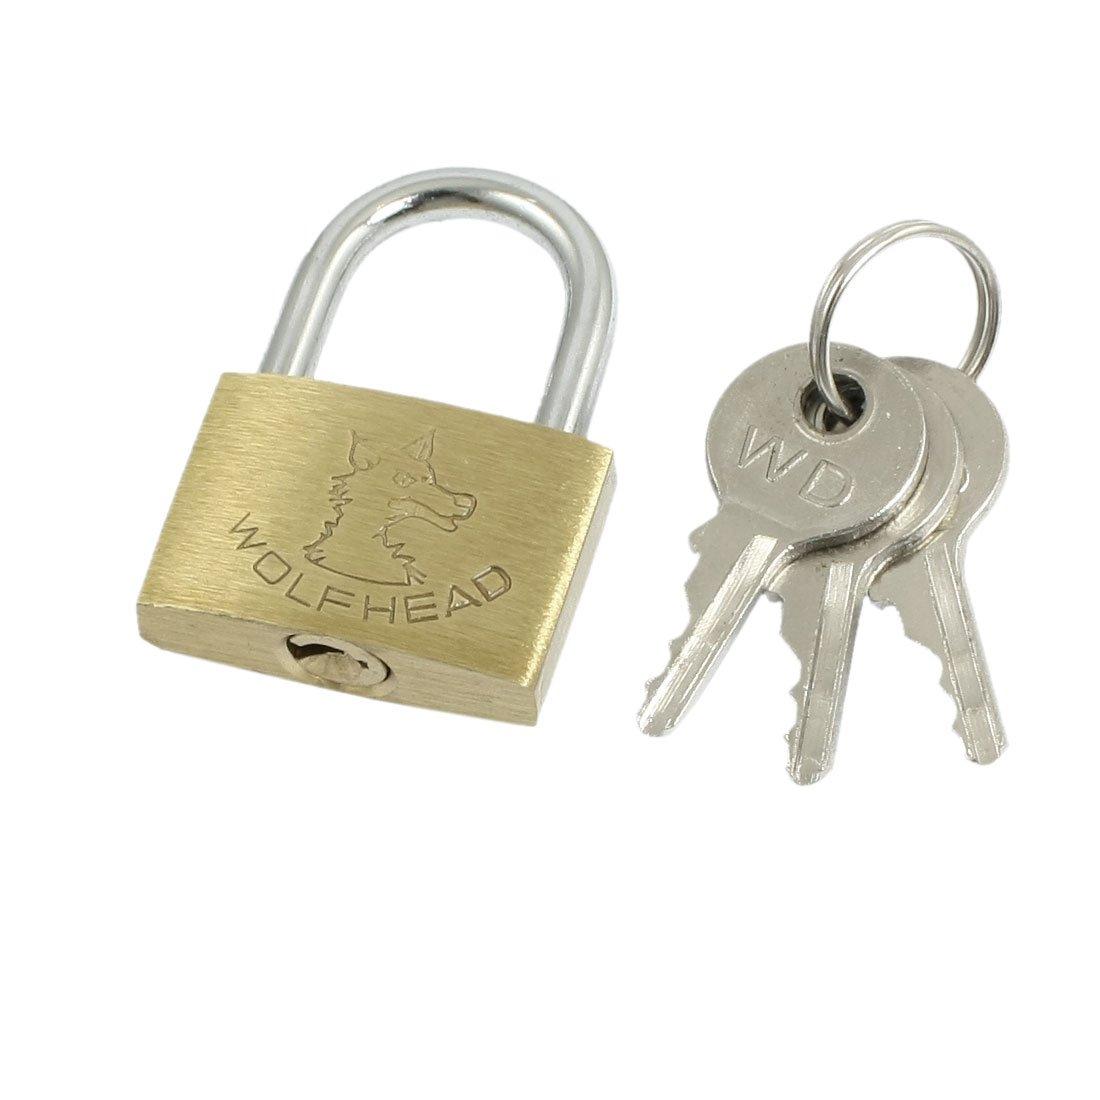 uxcell Cabinet Jewlery Box Packsack Brass 20mm Width Padlock Gold Tone w Keys